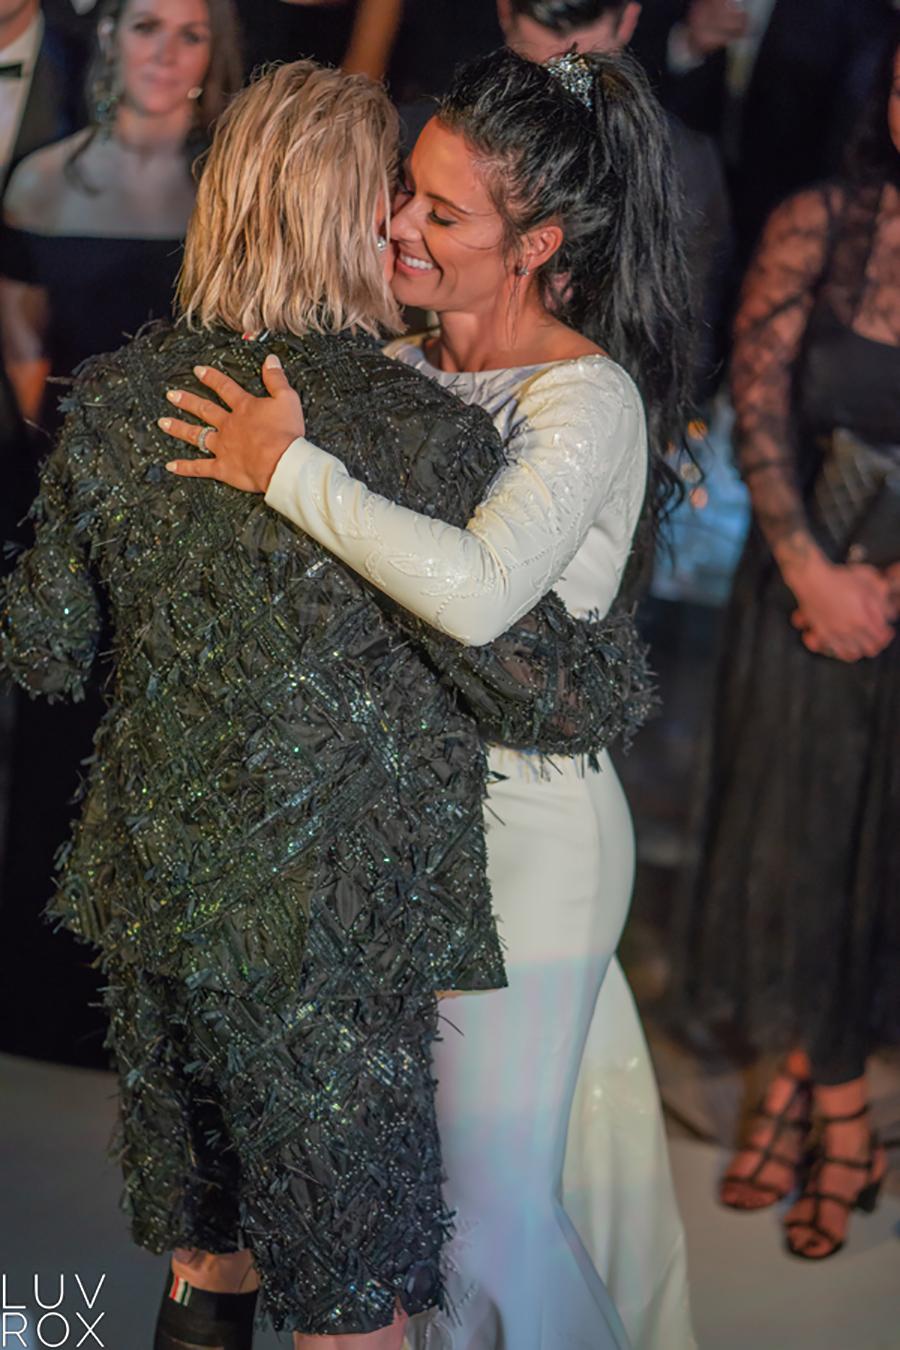 Ali Krieger and Ashlyn Harris Wedding